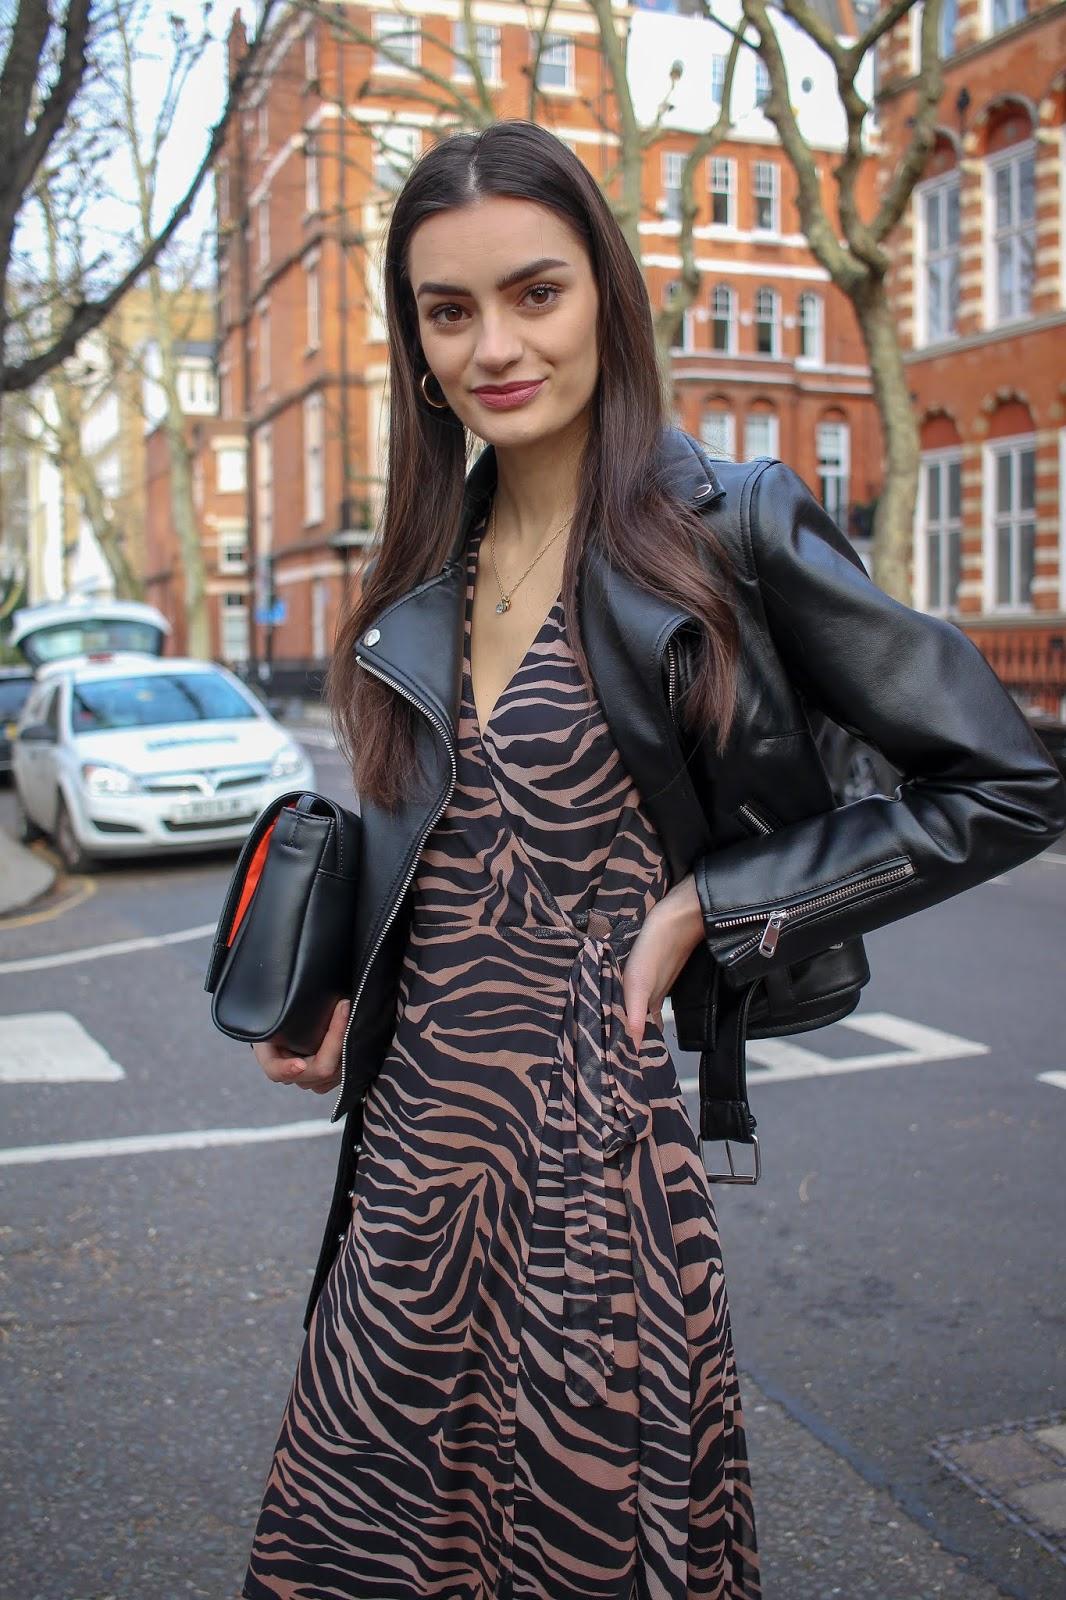 styling tiger print dress day-to-night